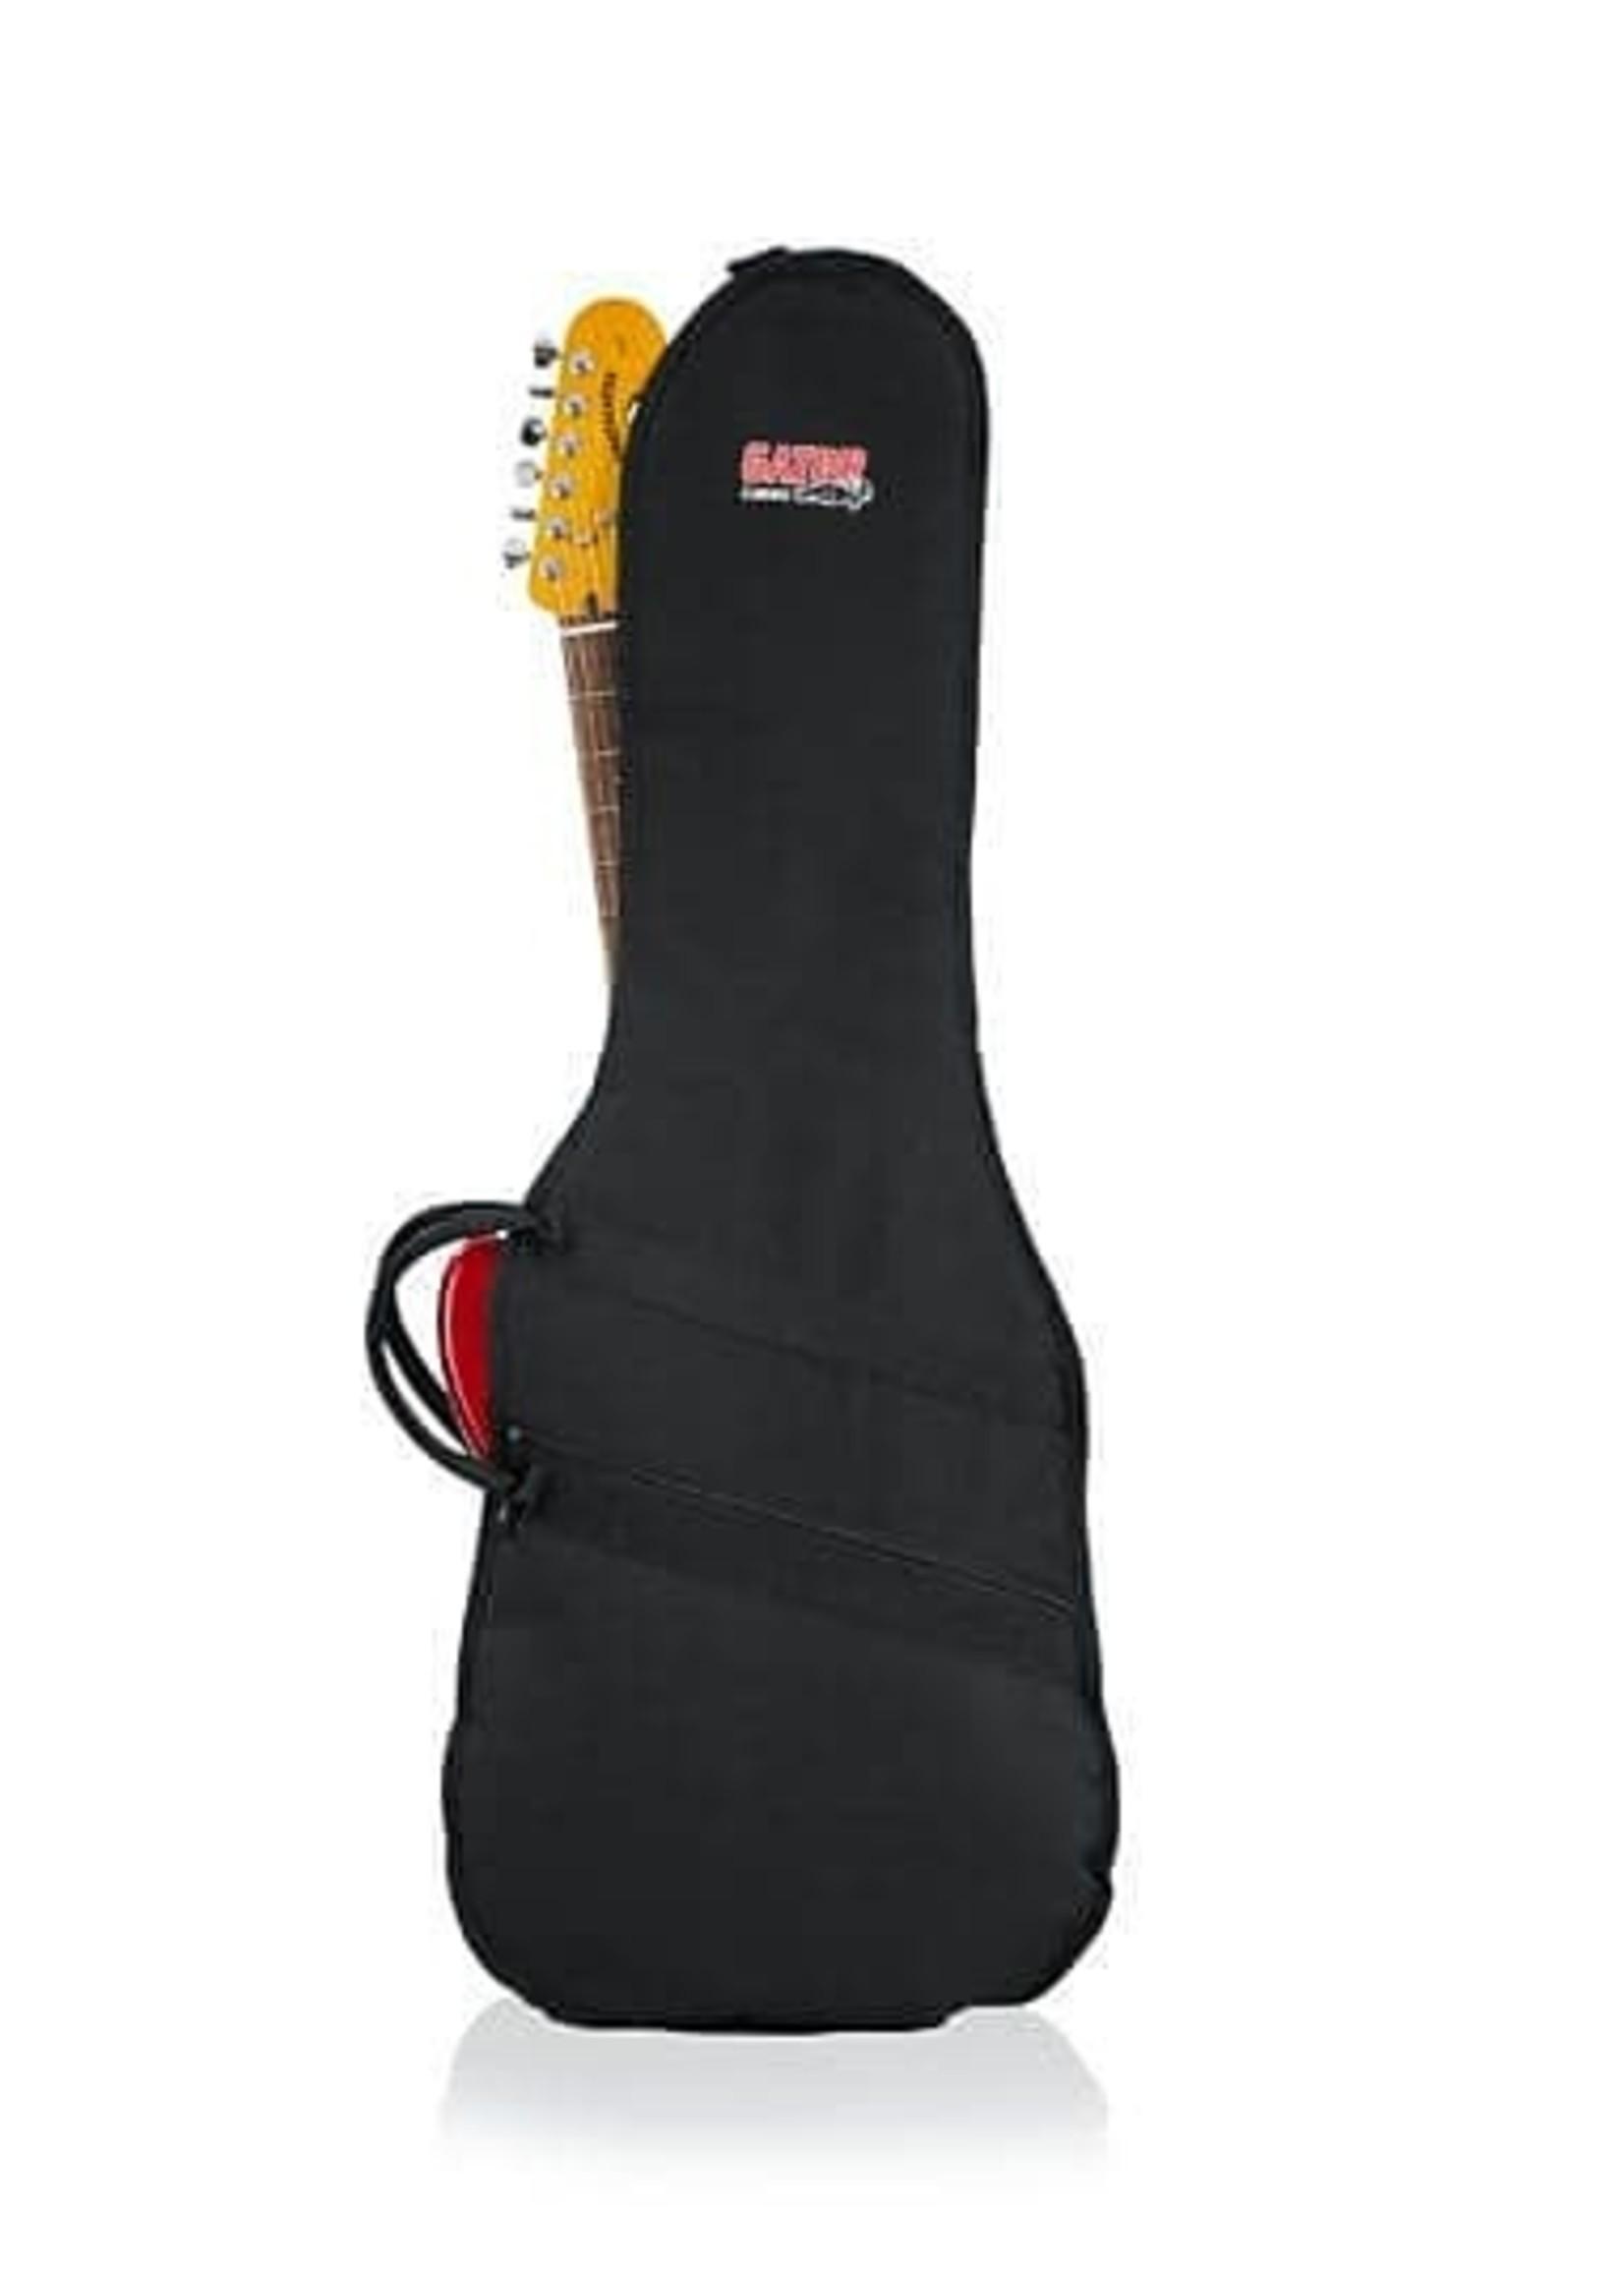 GATOR Gator Economy Gig Bag - Electric Guitar